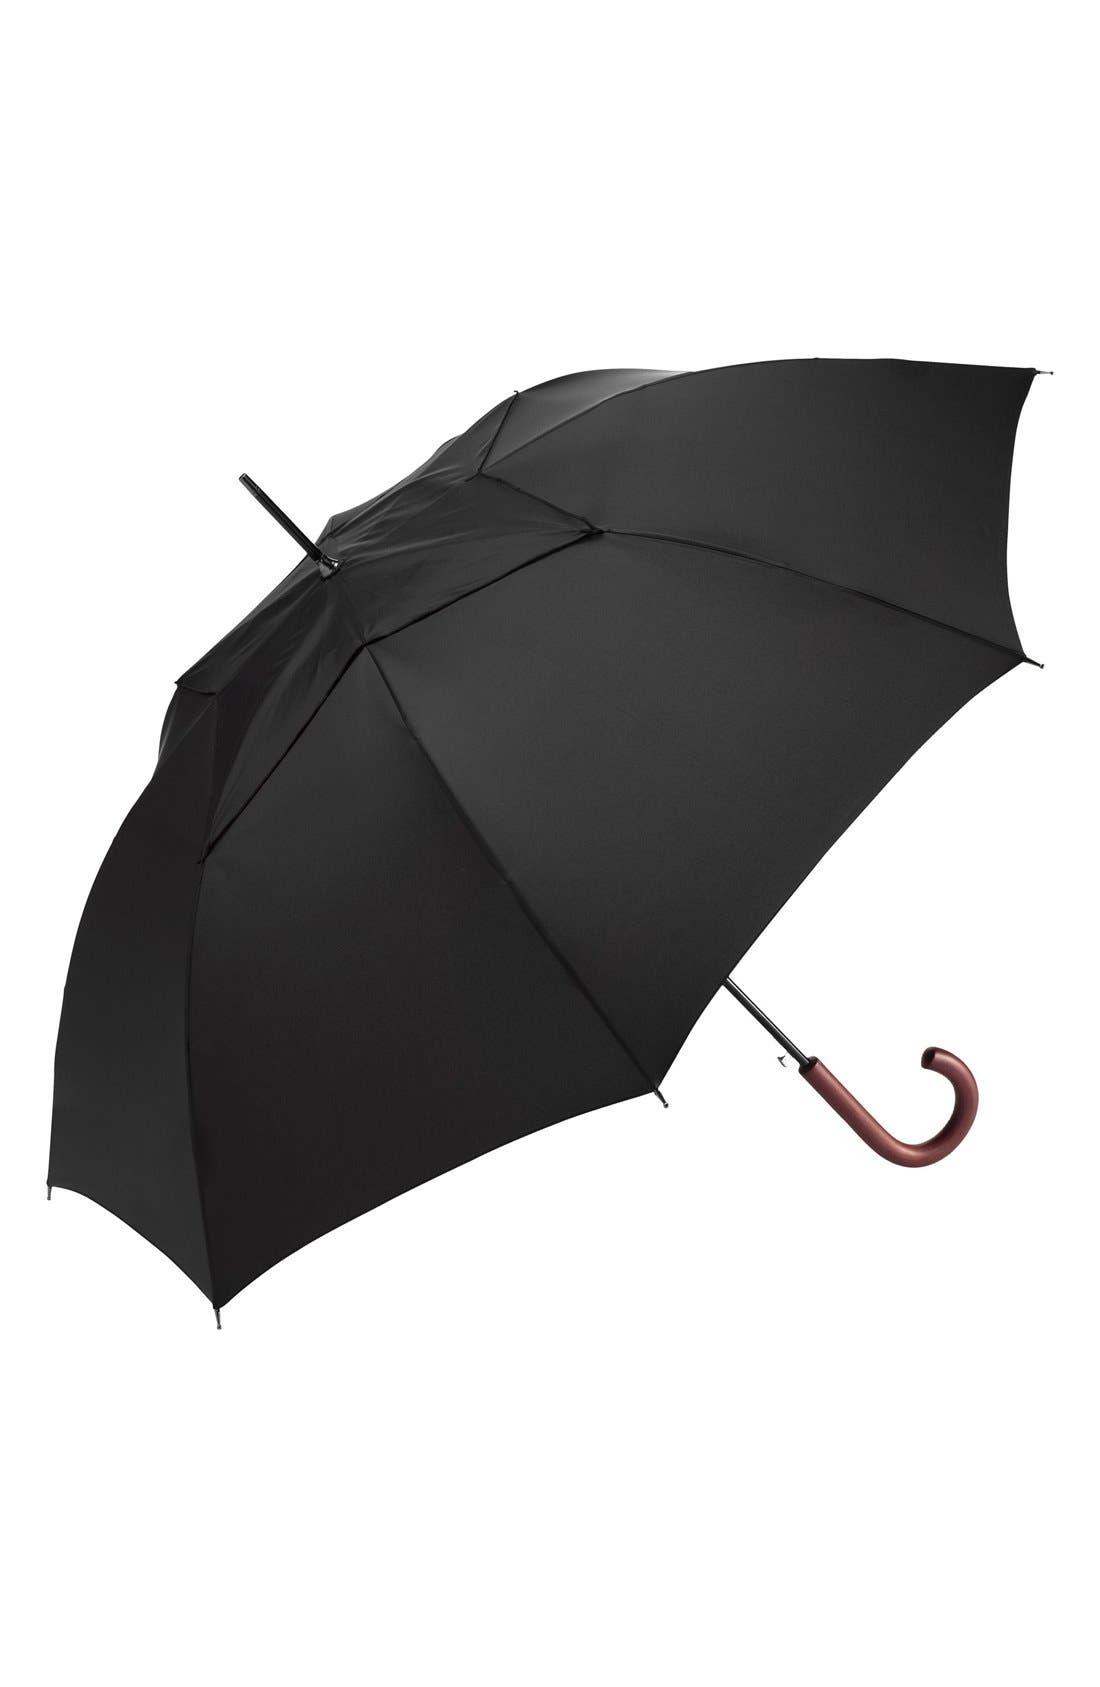 'WindPro<sup>®</sup>' Auto Open & Close Umbrella,                             Main thumbnail 1, color,                             BLACK